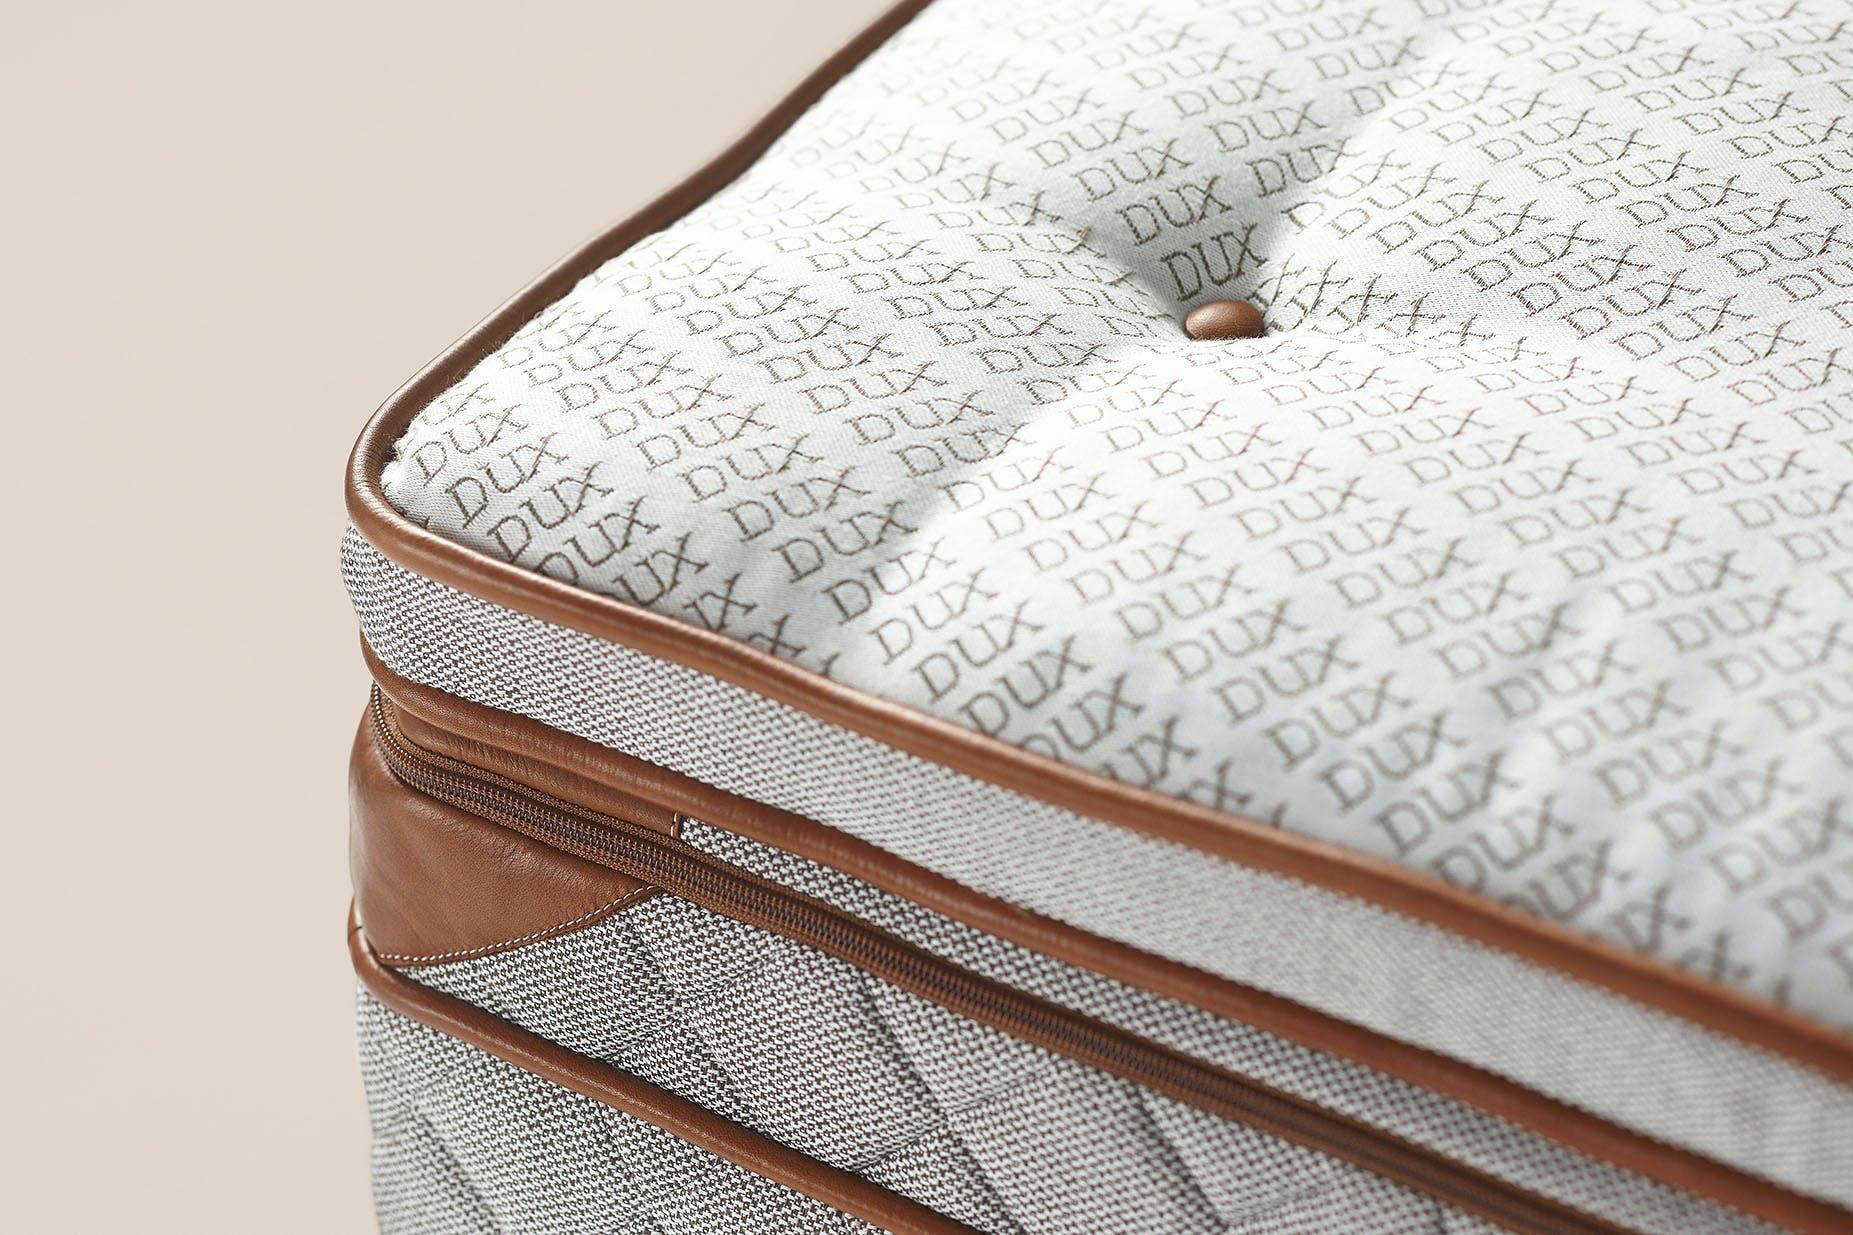 dux seng madras